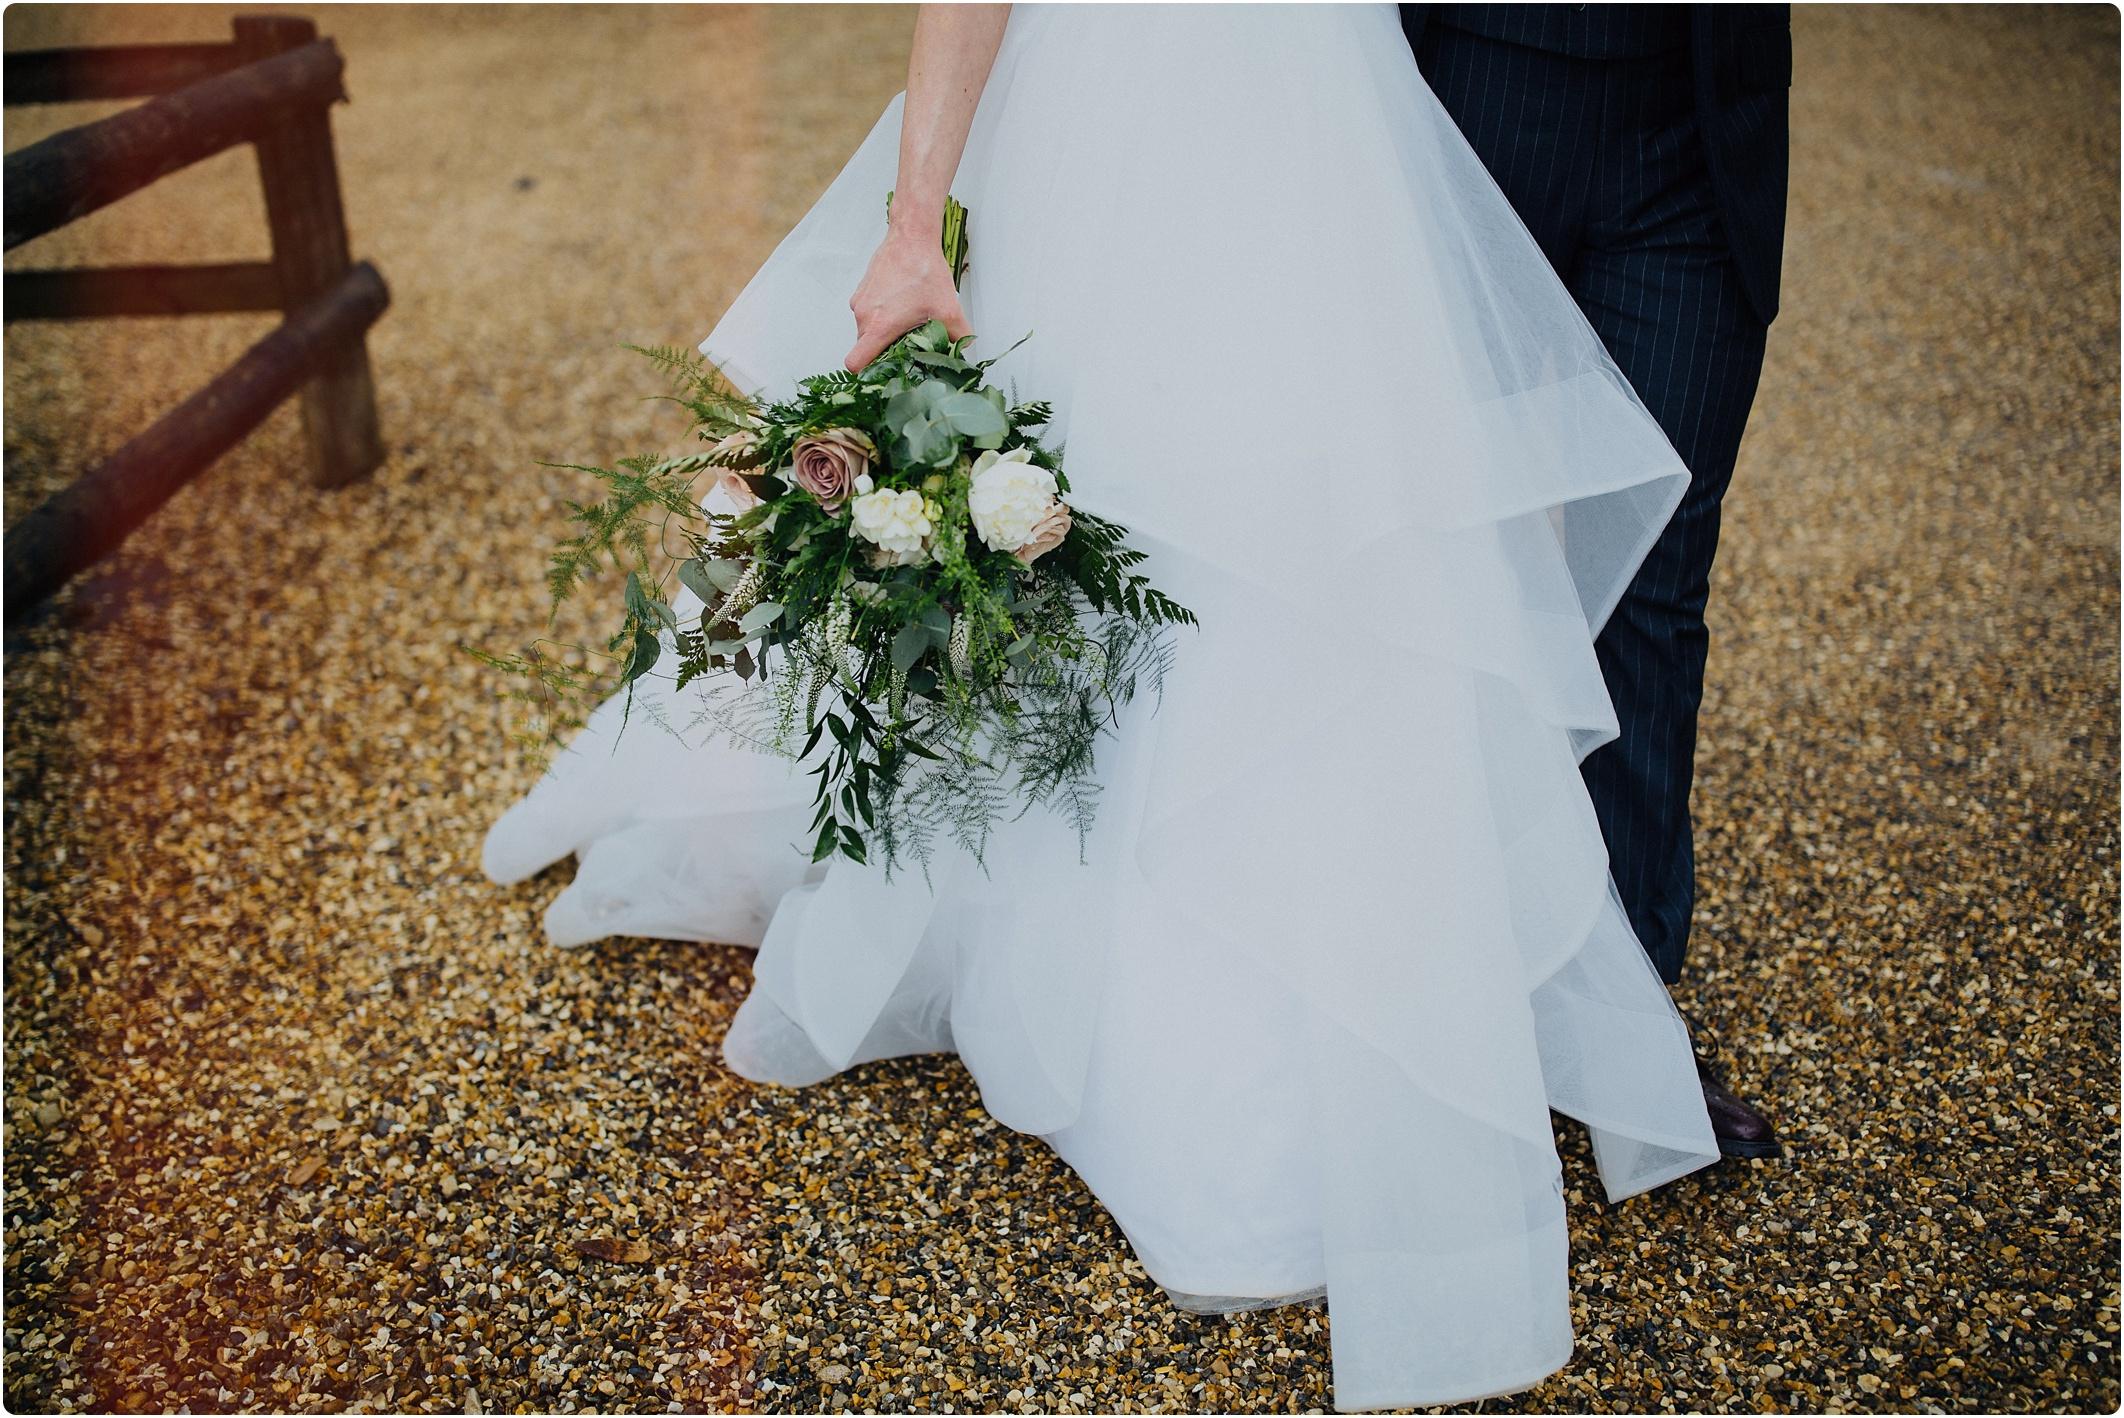 Cripps Barn bouquet by go wild flowers